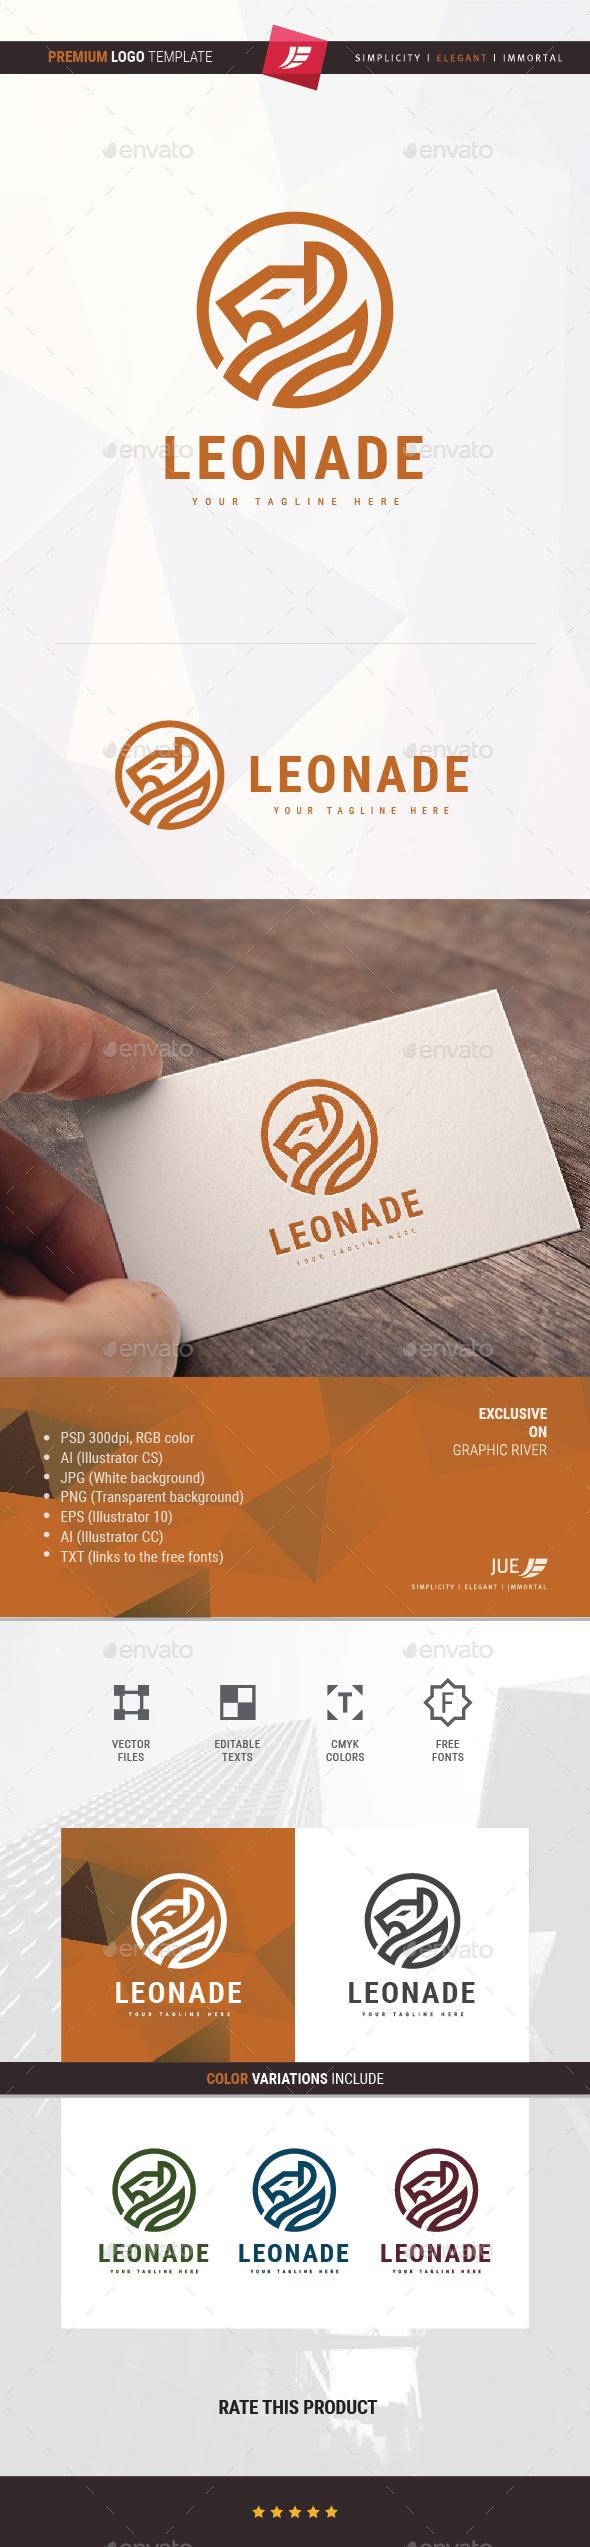 Lion Leonade Logo - Animals Logo Templates